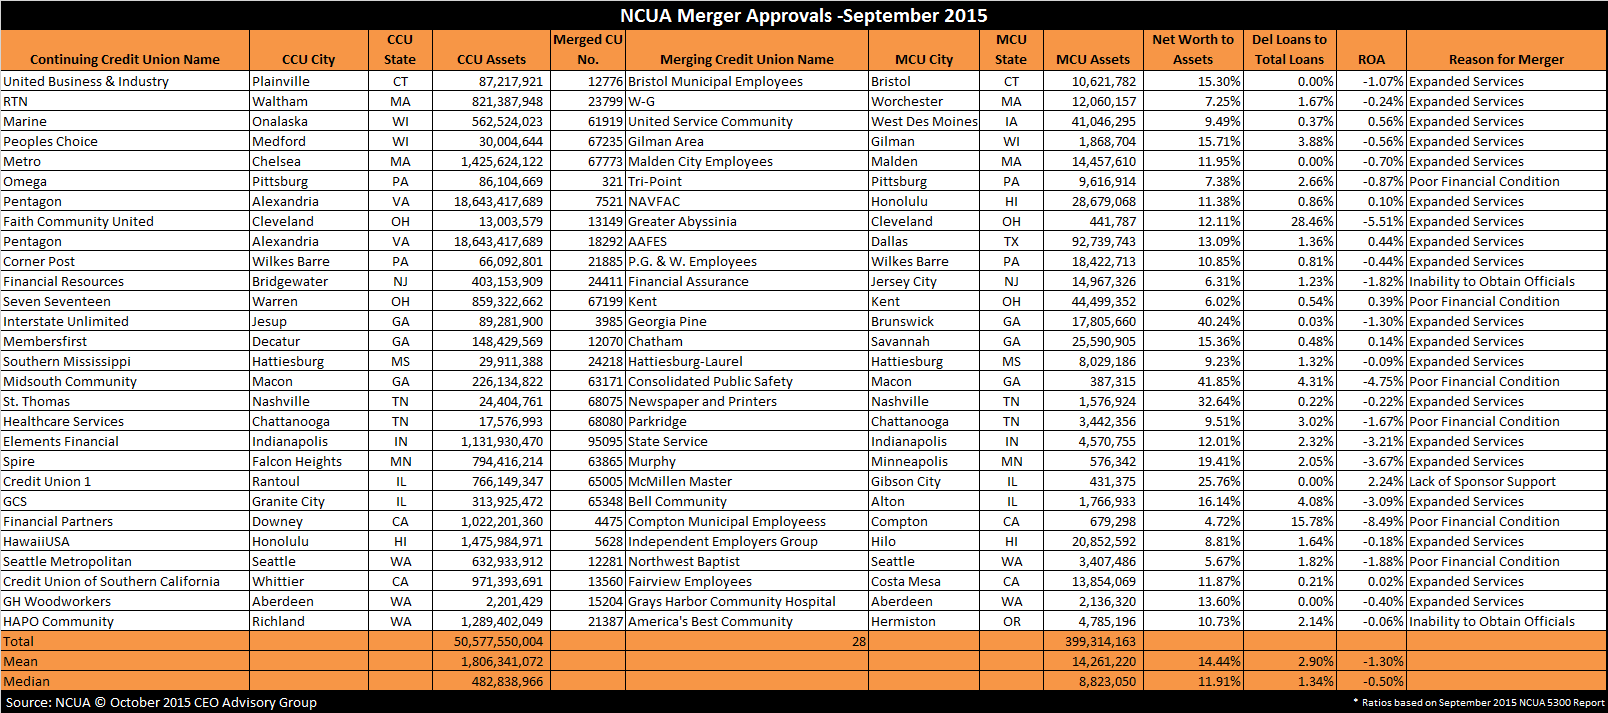 Credit Union Merger Approvals - September 2015